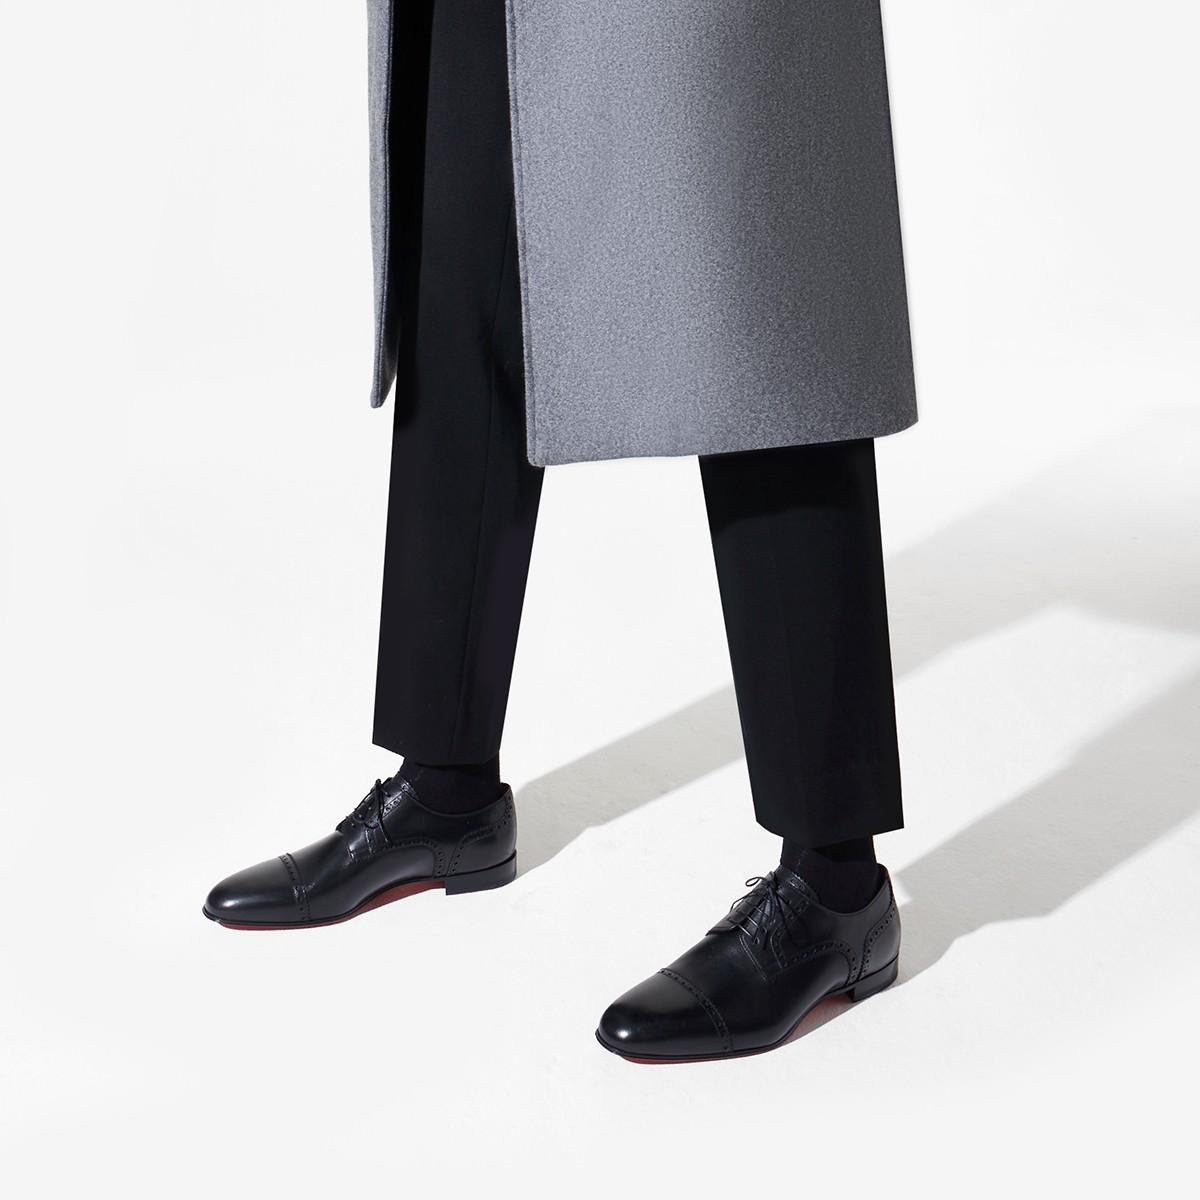 鞋履 - Eygeny Calf - Christian Louboutin